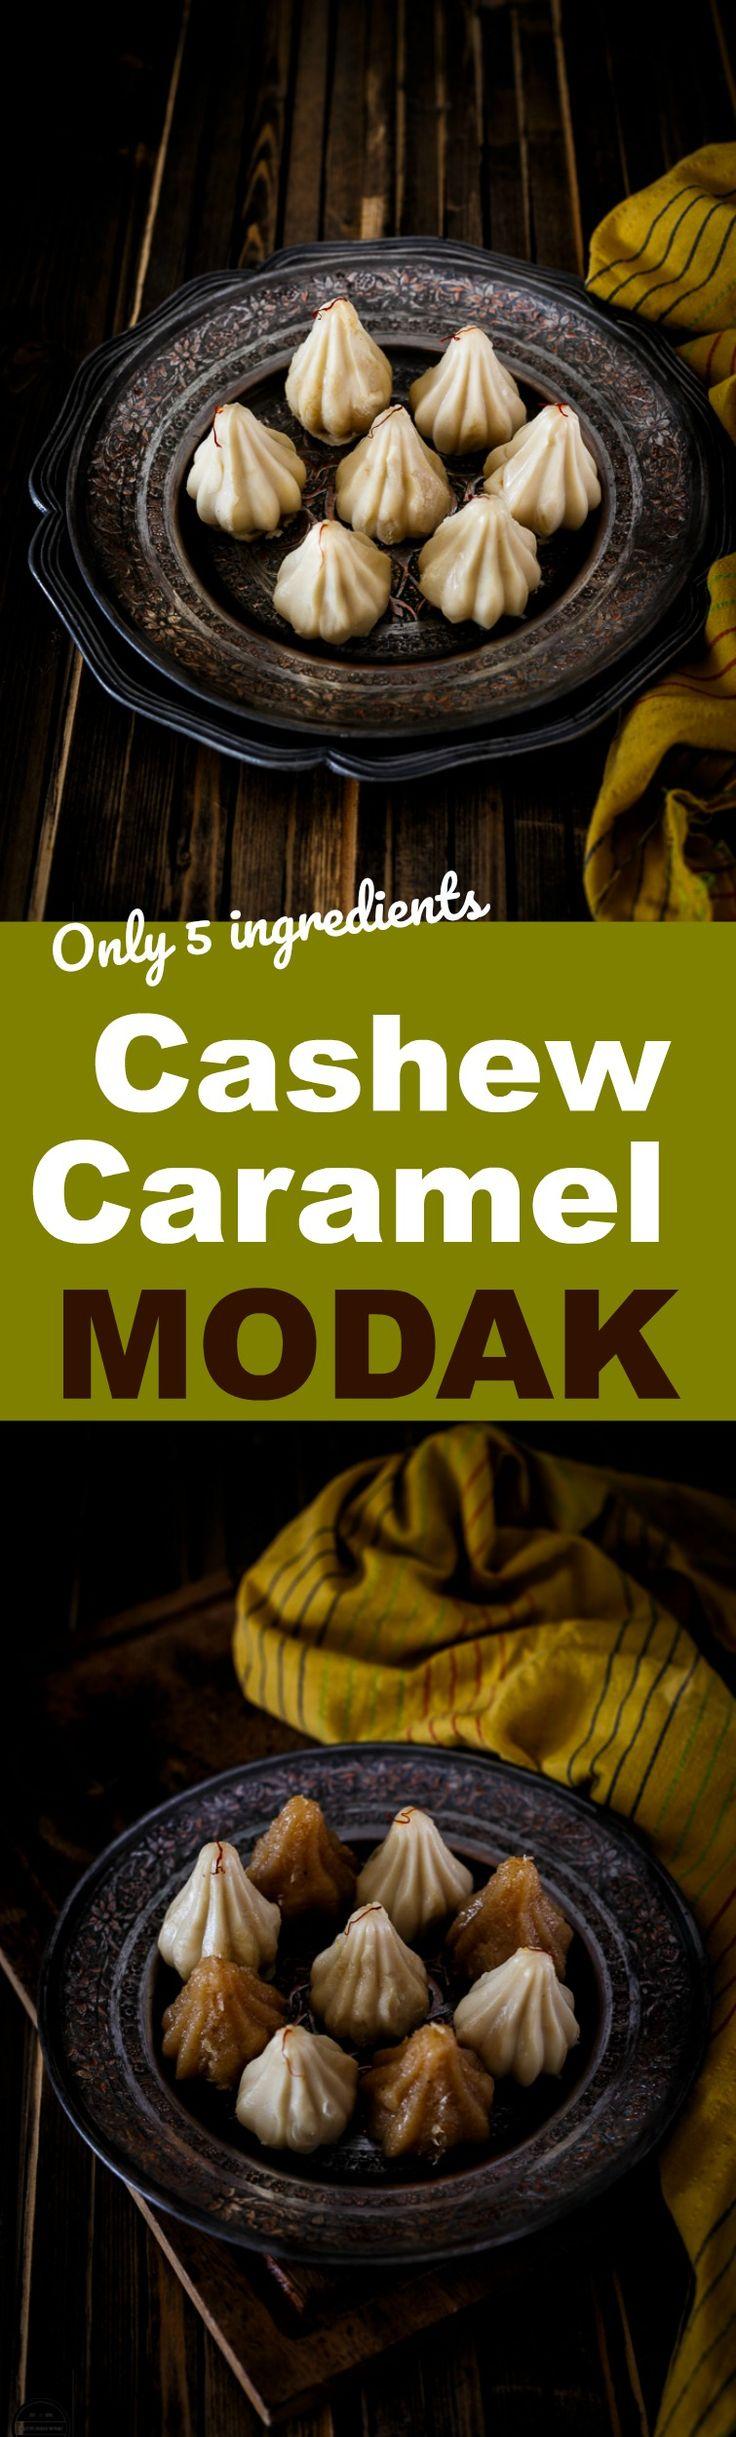 Cashew Caramel Modak-Indian Festival Recipe